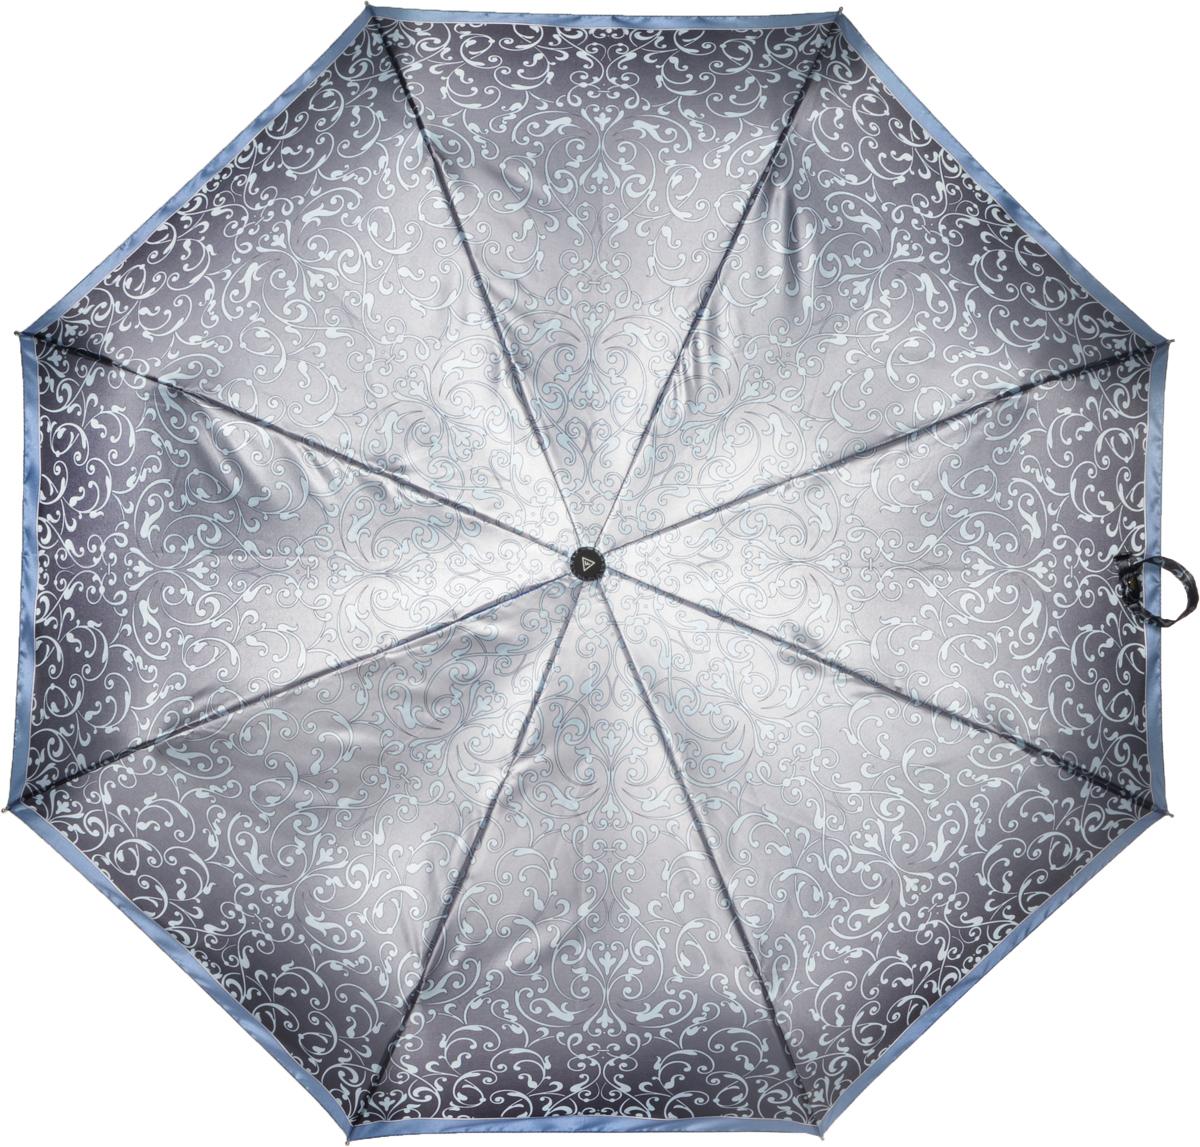 Зонт женский Fabretti, автомат, 3 сложения, цвет: серый. L-16106-1L-16106-1Зонт женский Fabretti, облегченный суперавтомат, 3 сложения